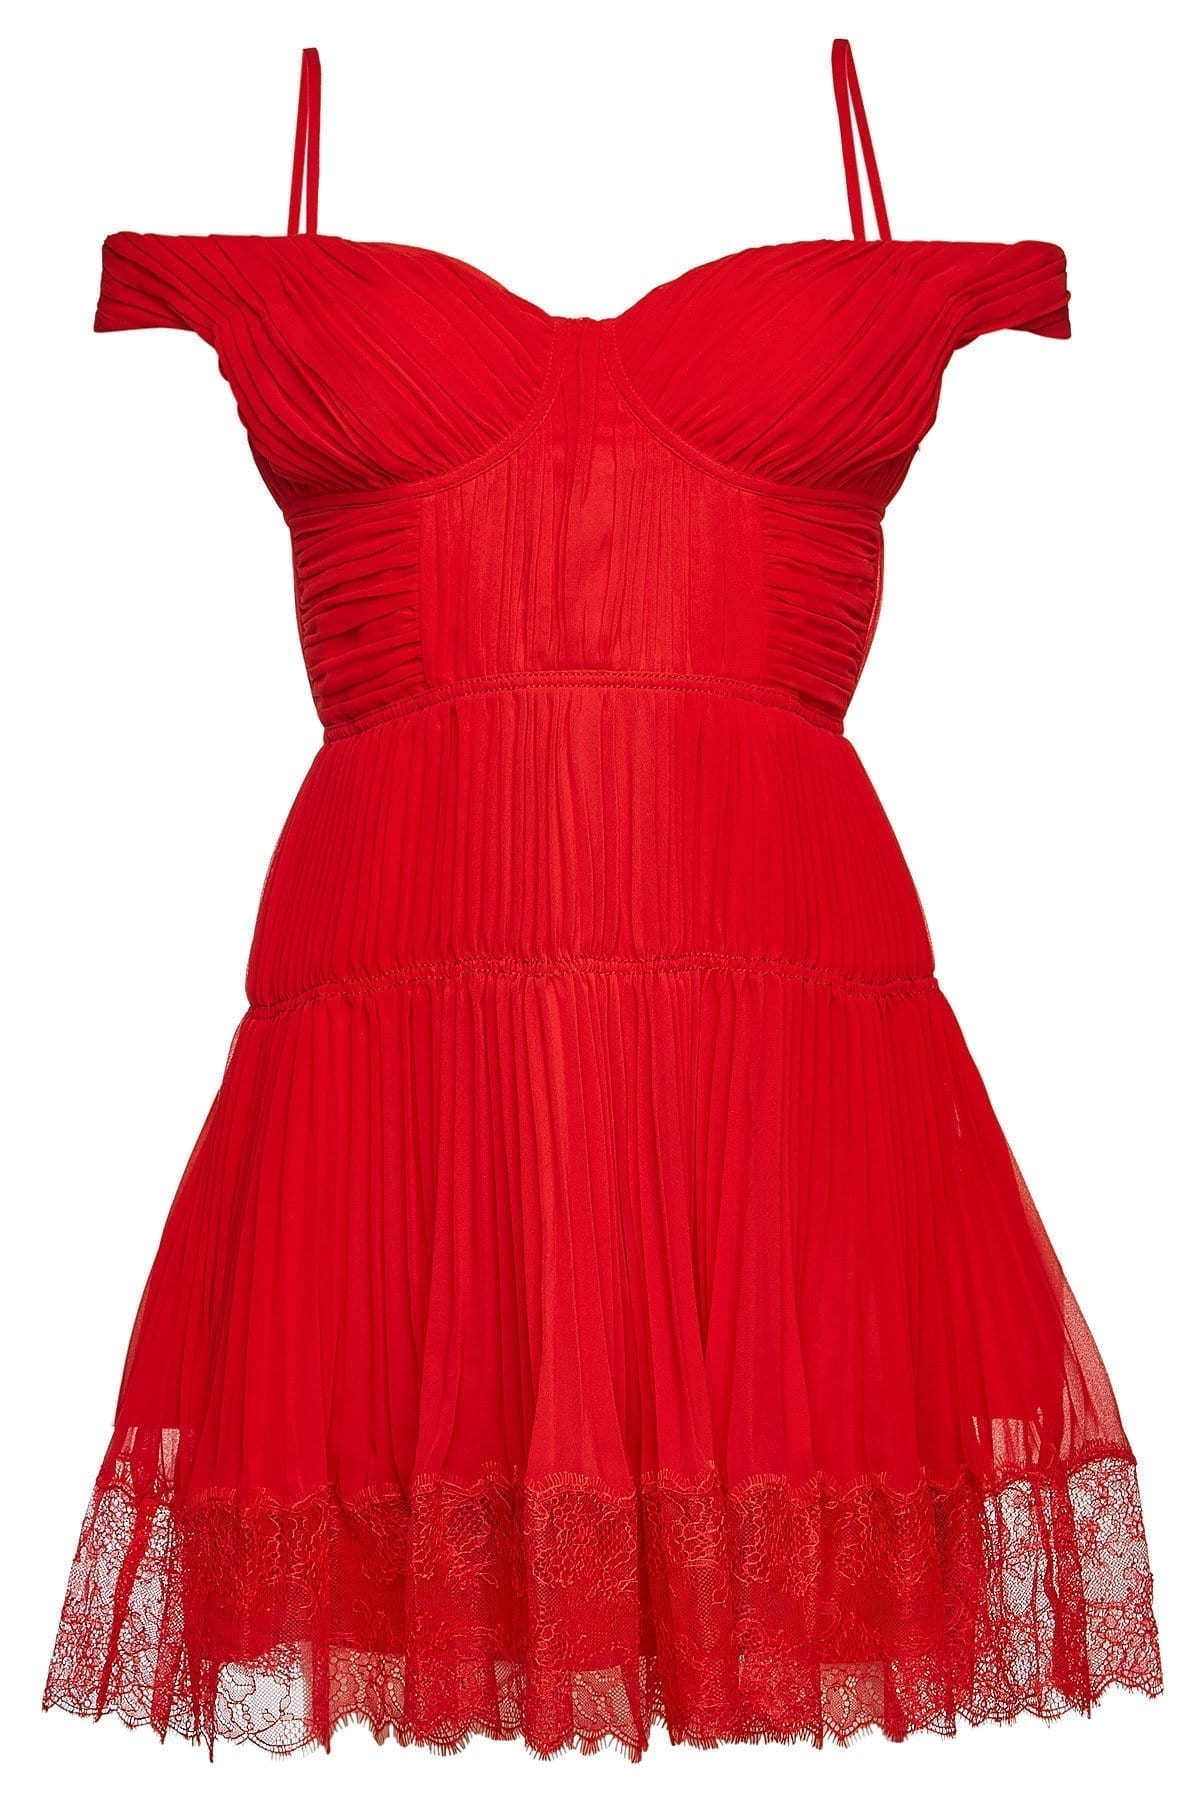 SELF-PORTRAIT Off-Shoulder Lace Chiffon Mini Red Dress